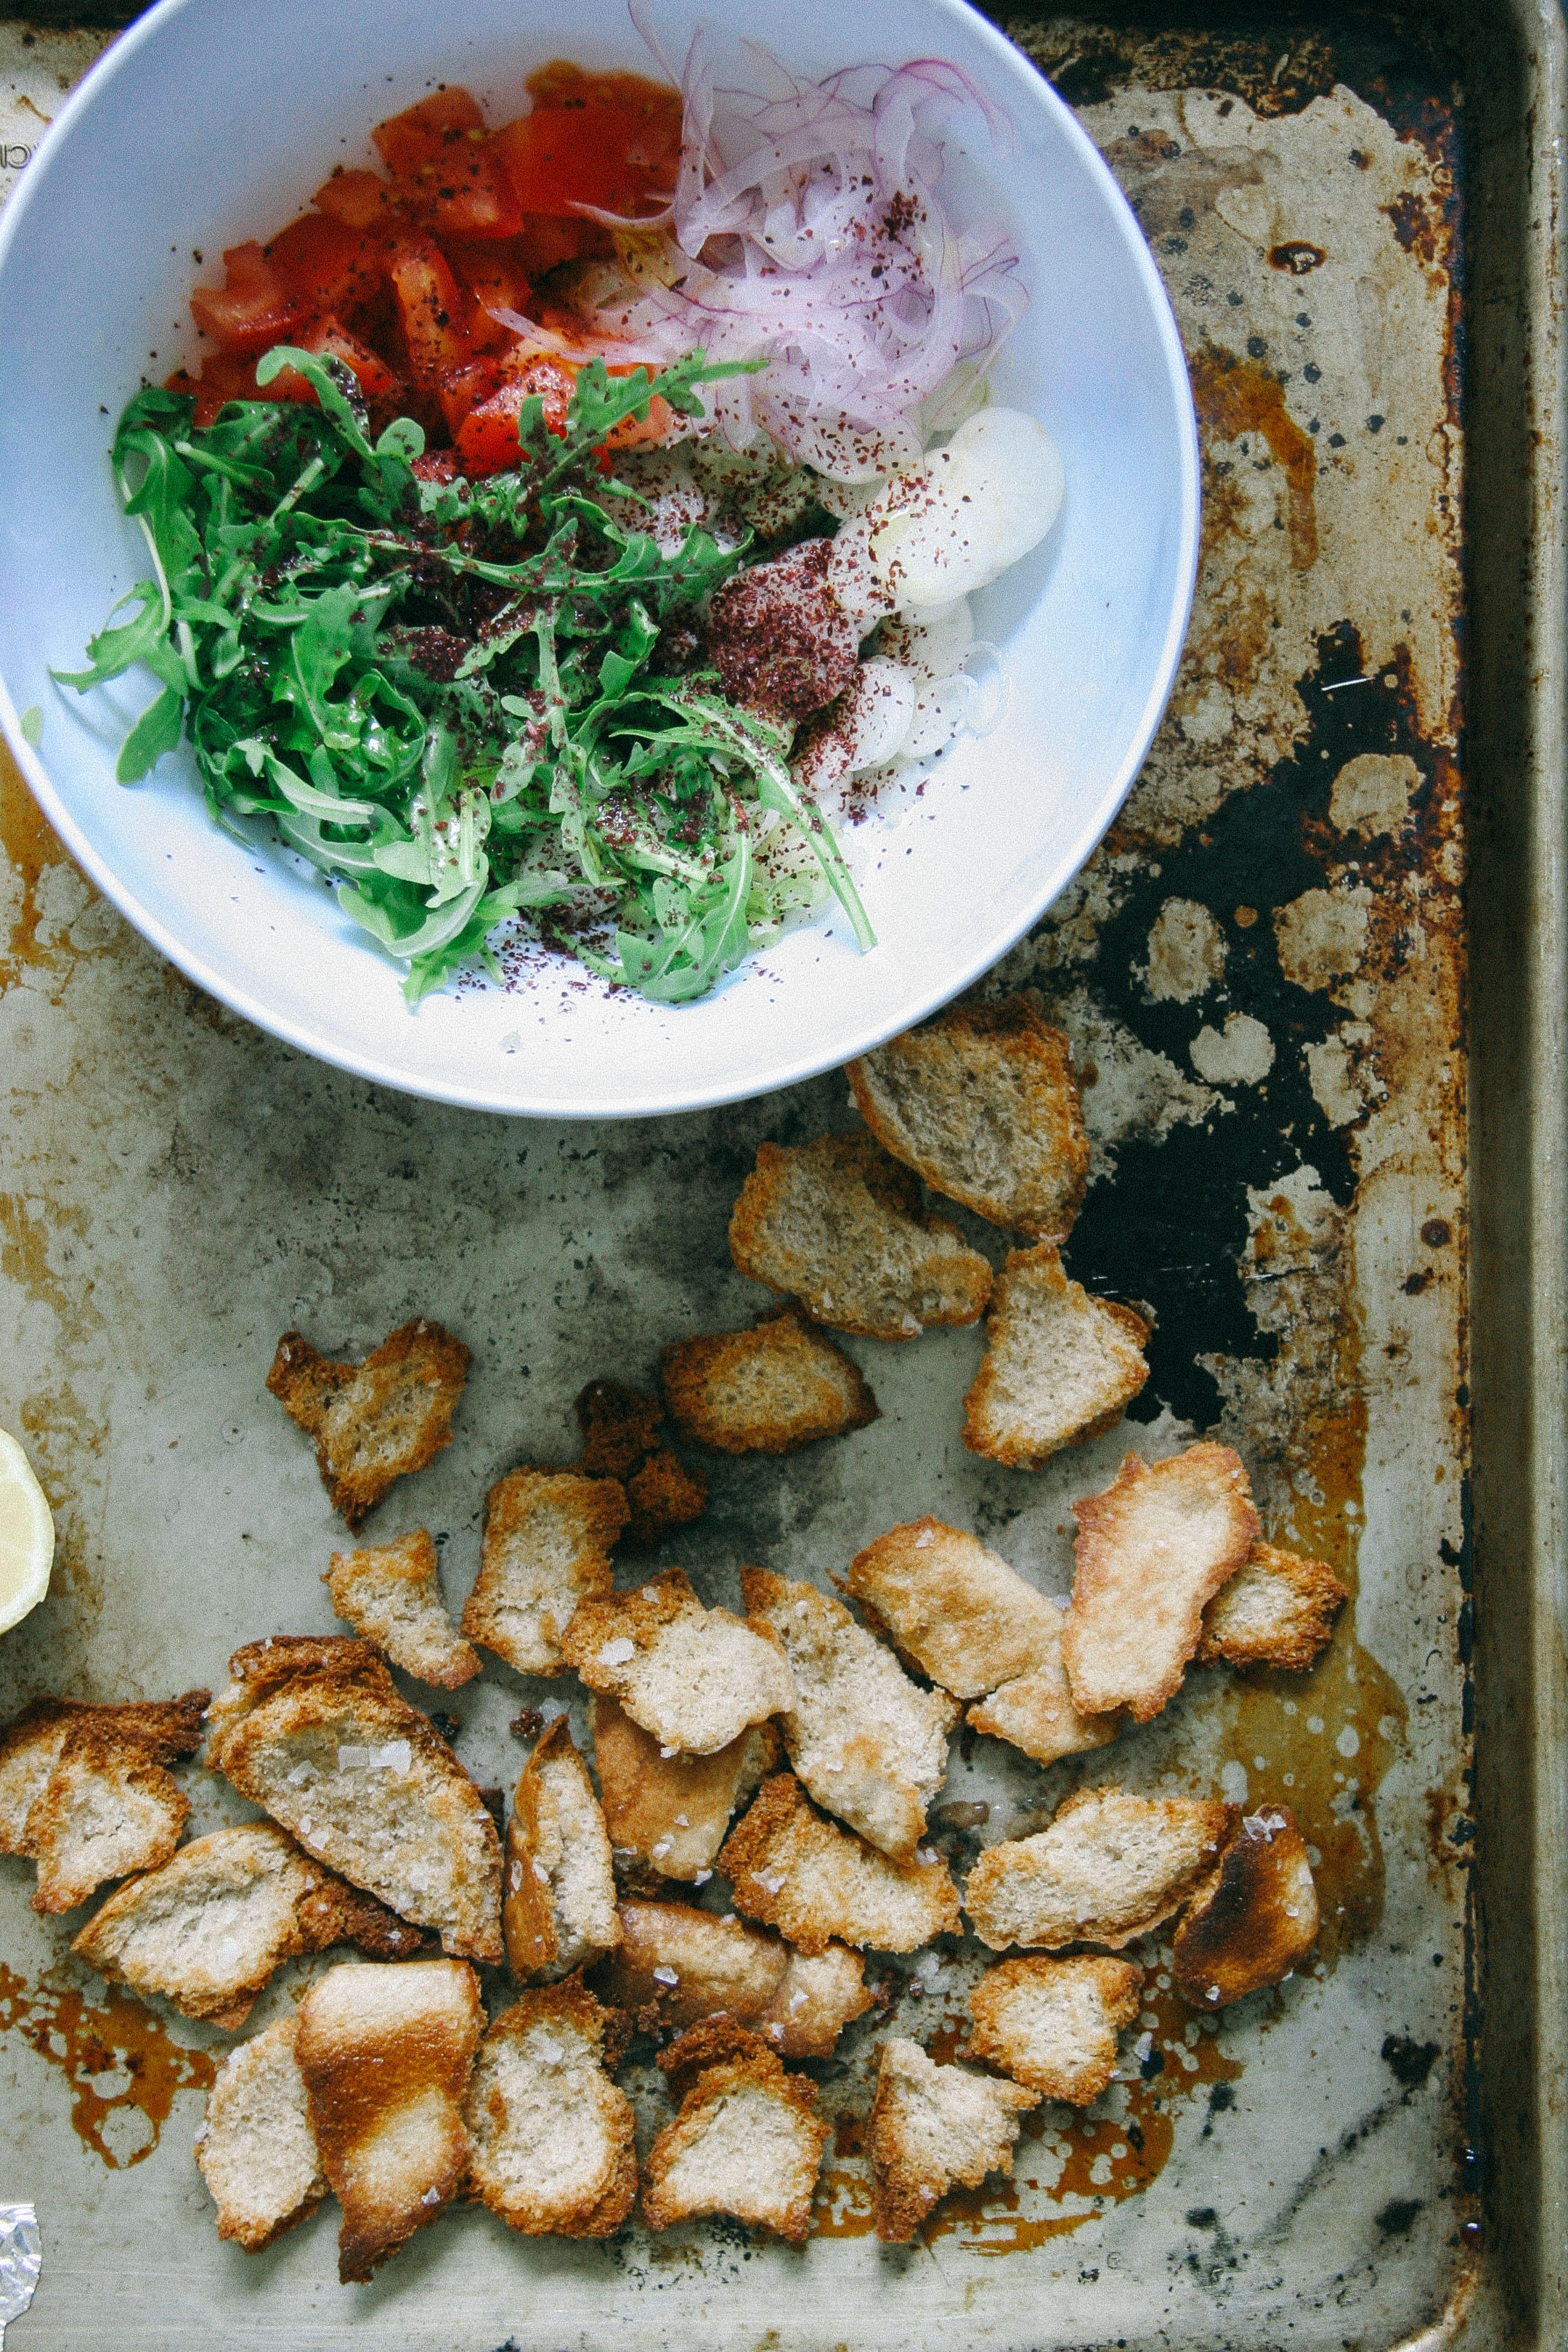 Fattoush | Israeli Arabic Fattoush Salad with Feta Cheese | I Will Not Eat Oysters